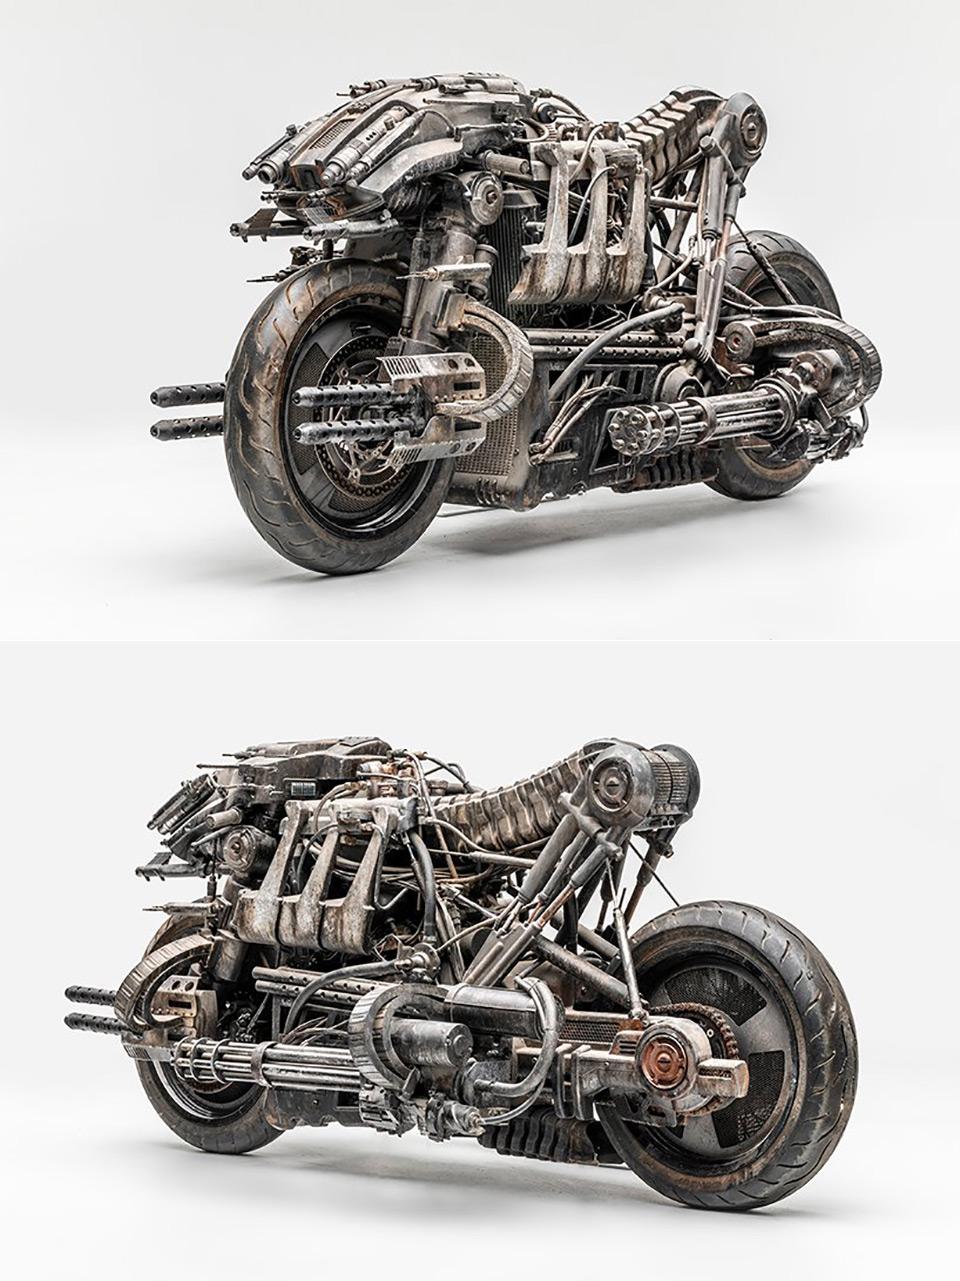 Ducati Hypermotard 1100 Terminator Salvation